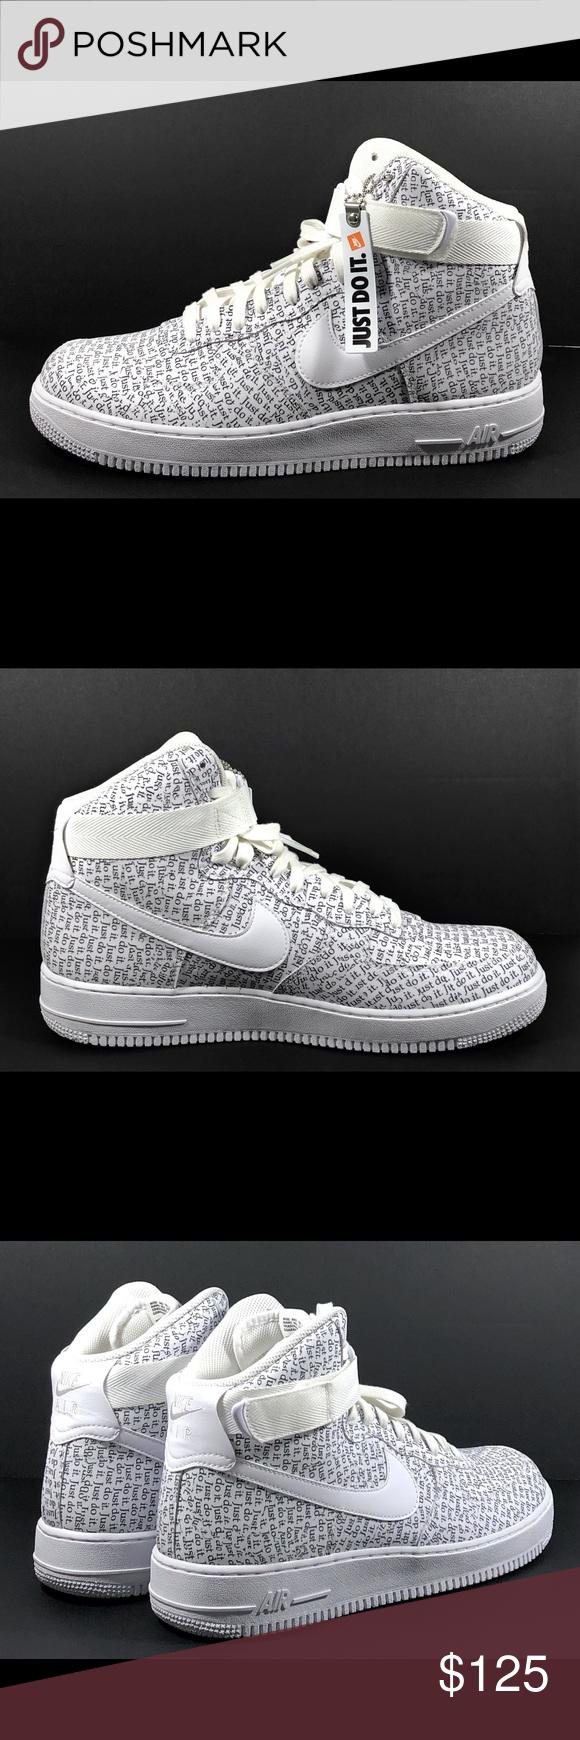 Nike Men Nike Air Force 1 High Lv8 'Just Do It' Aq9648